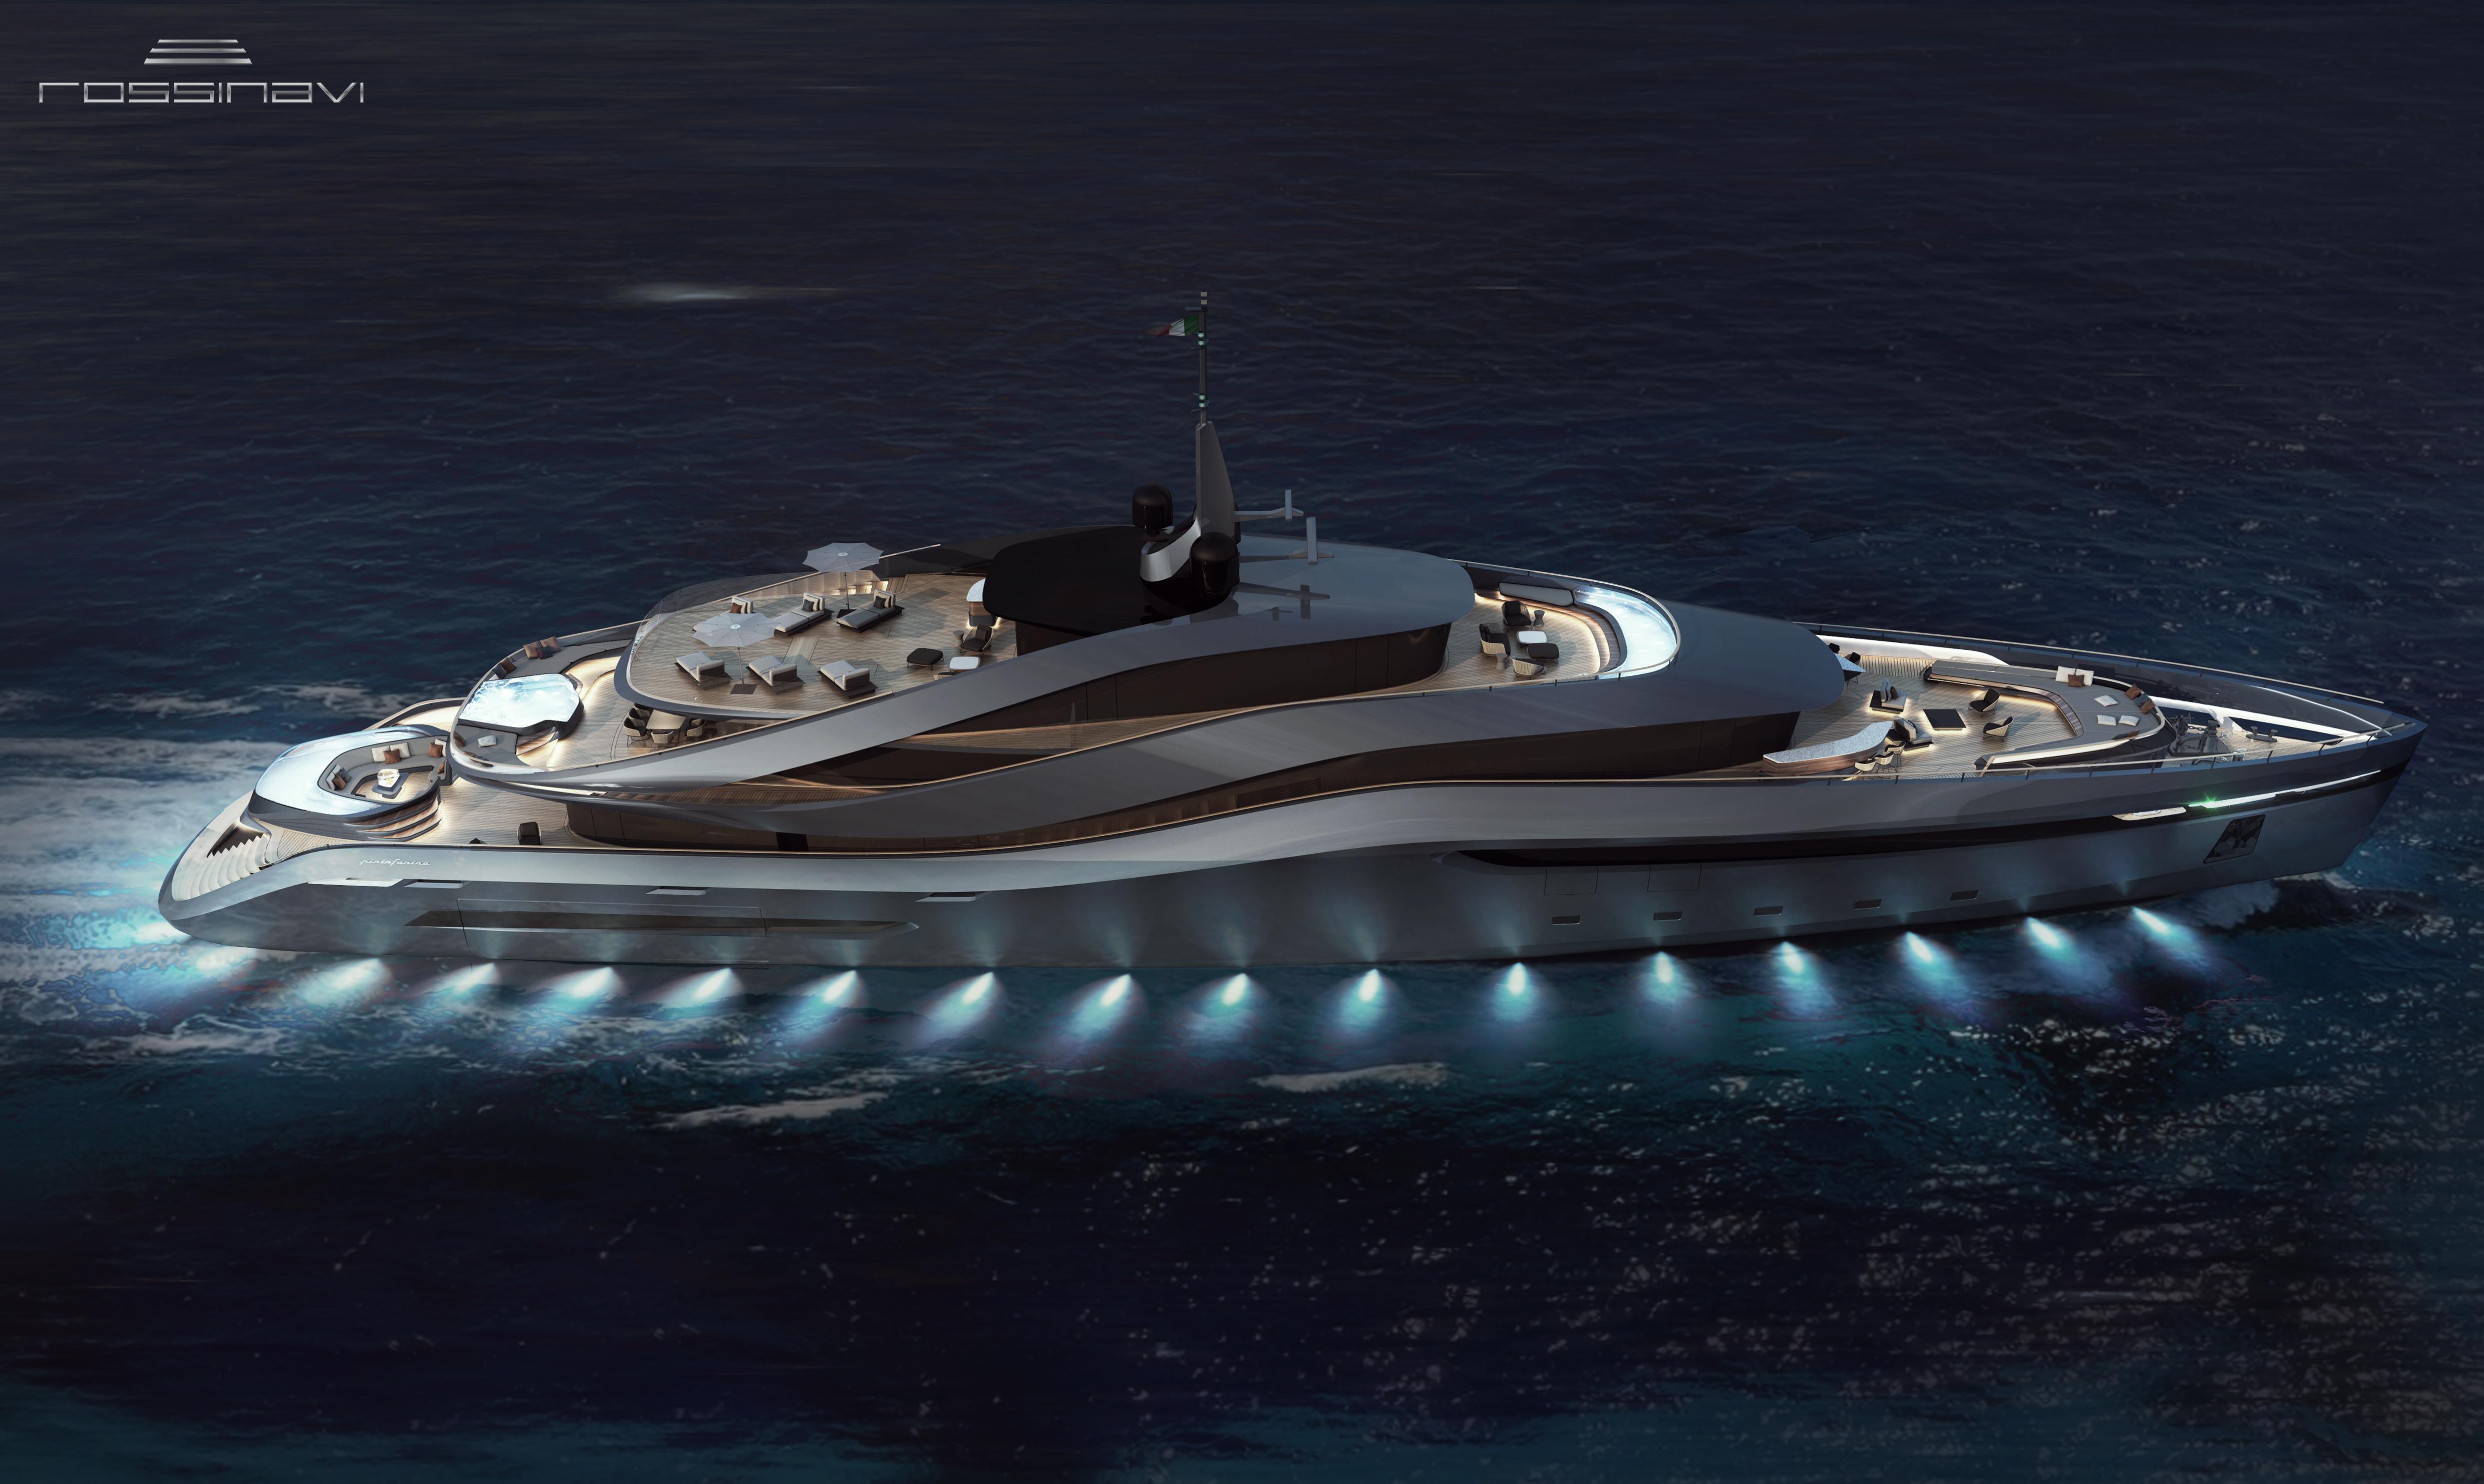 22405-rossinavi-and-pininfarina-present-the-aurea-superyacht.jpg